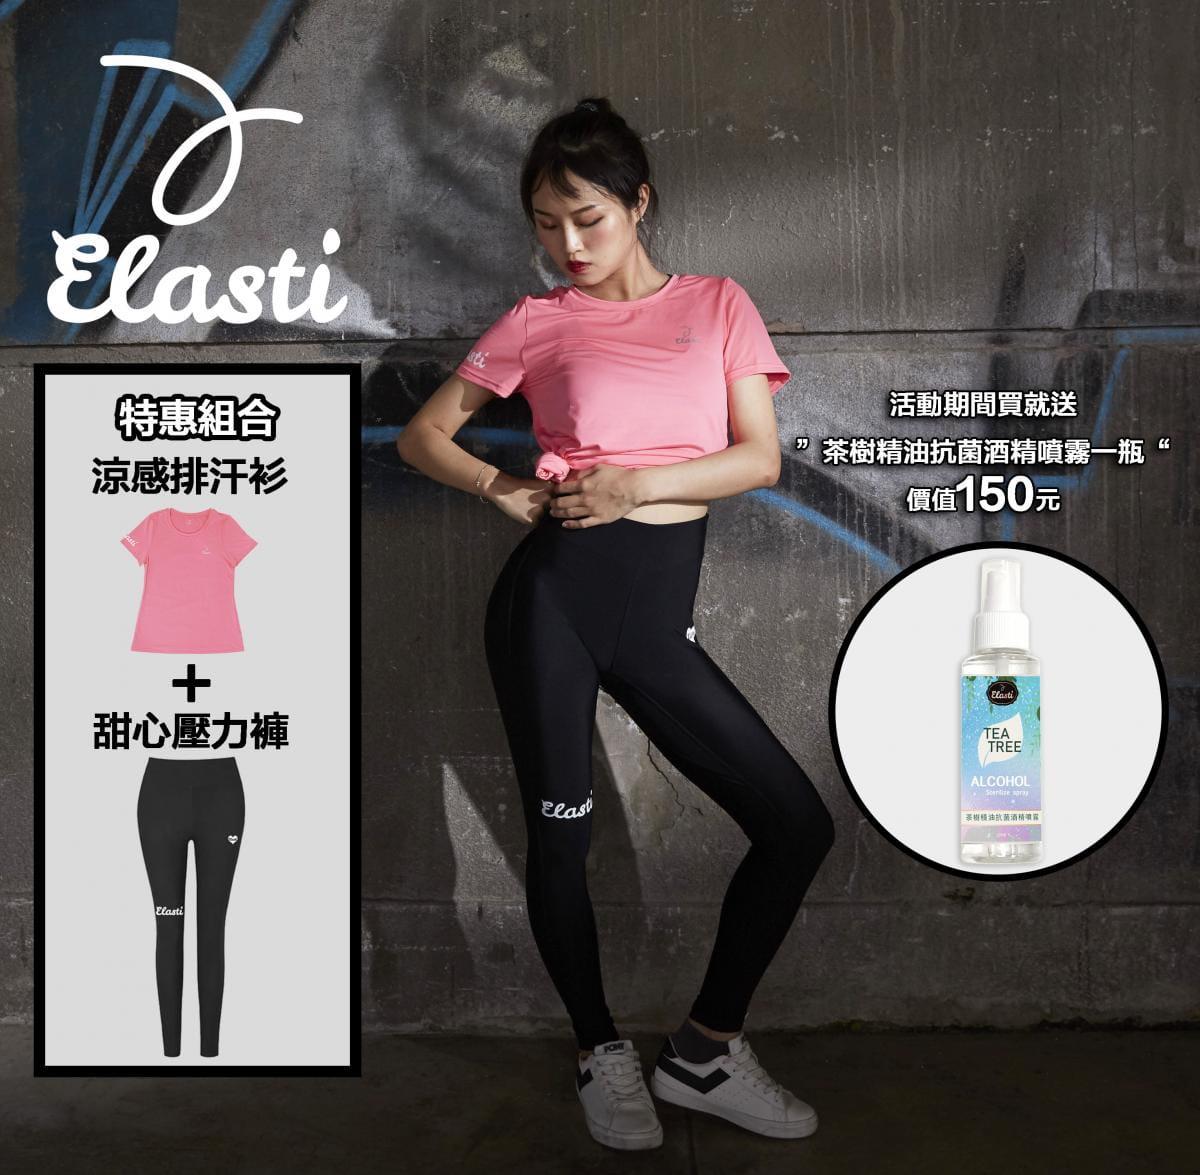 【ELASTI】甜心壓力褲+涼感排汗衫組合(活動特惠) 0